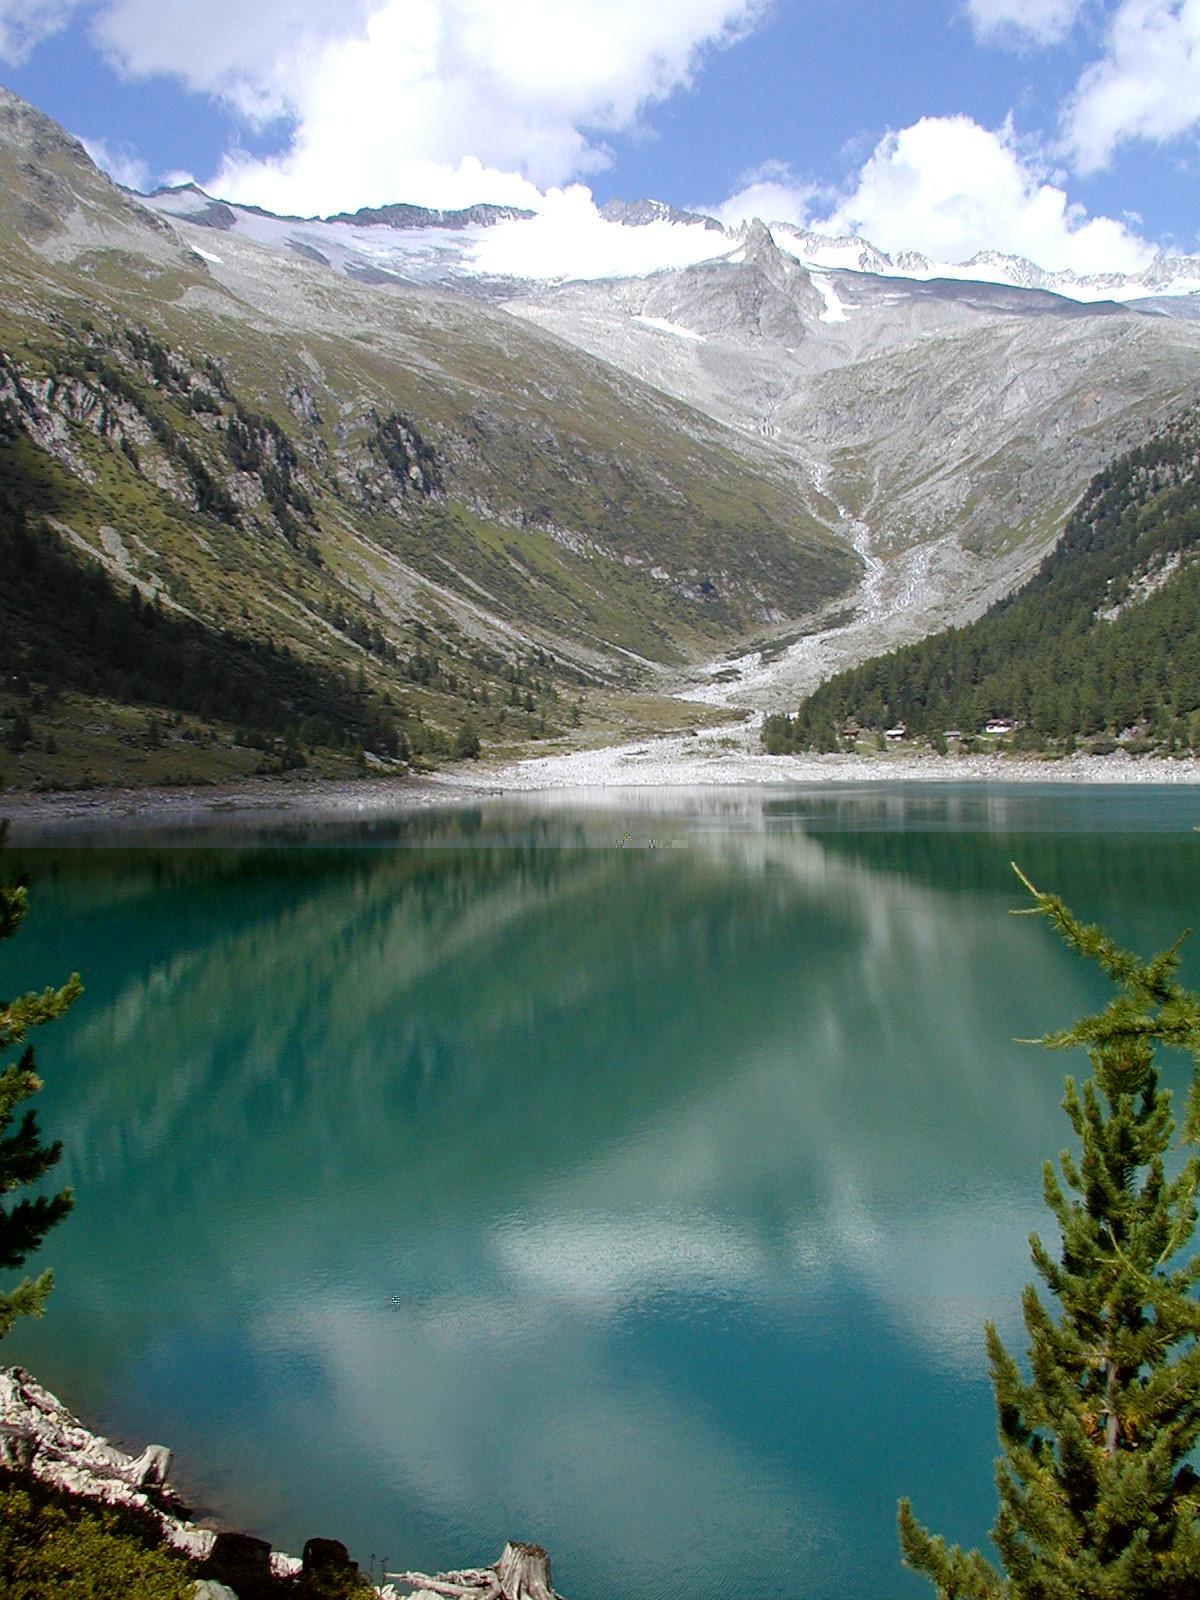 Lago di neves wikipedia for Lago n